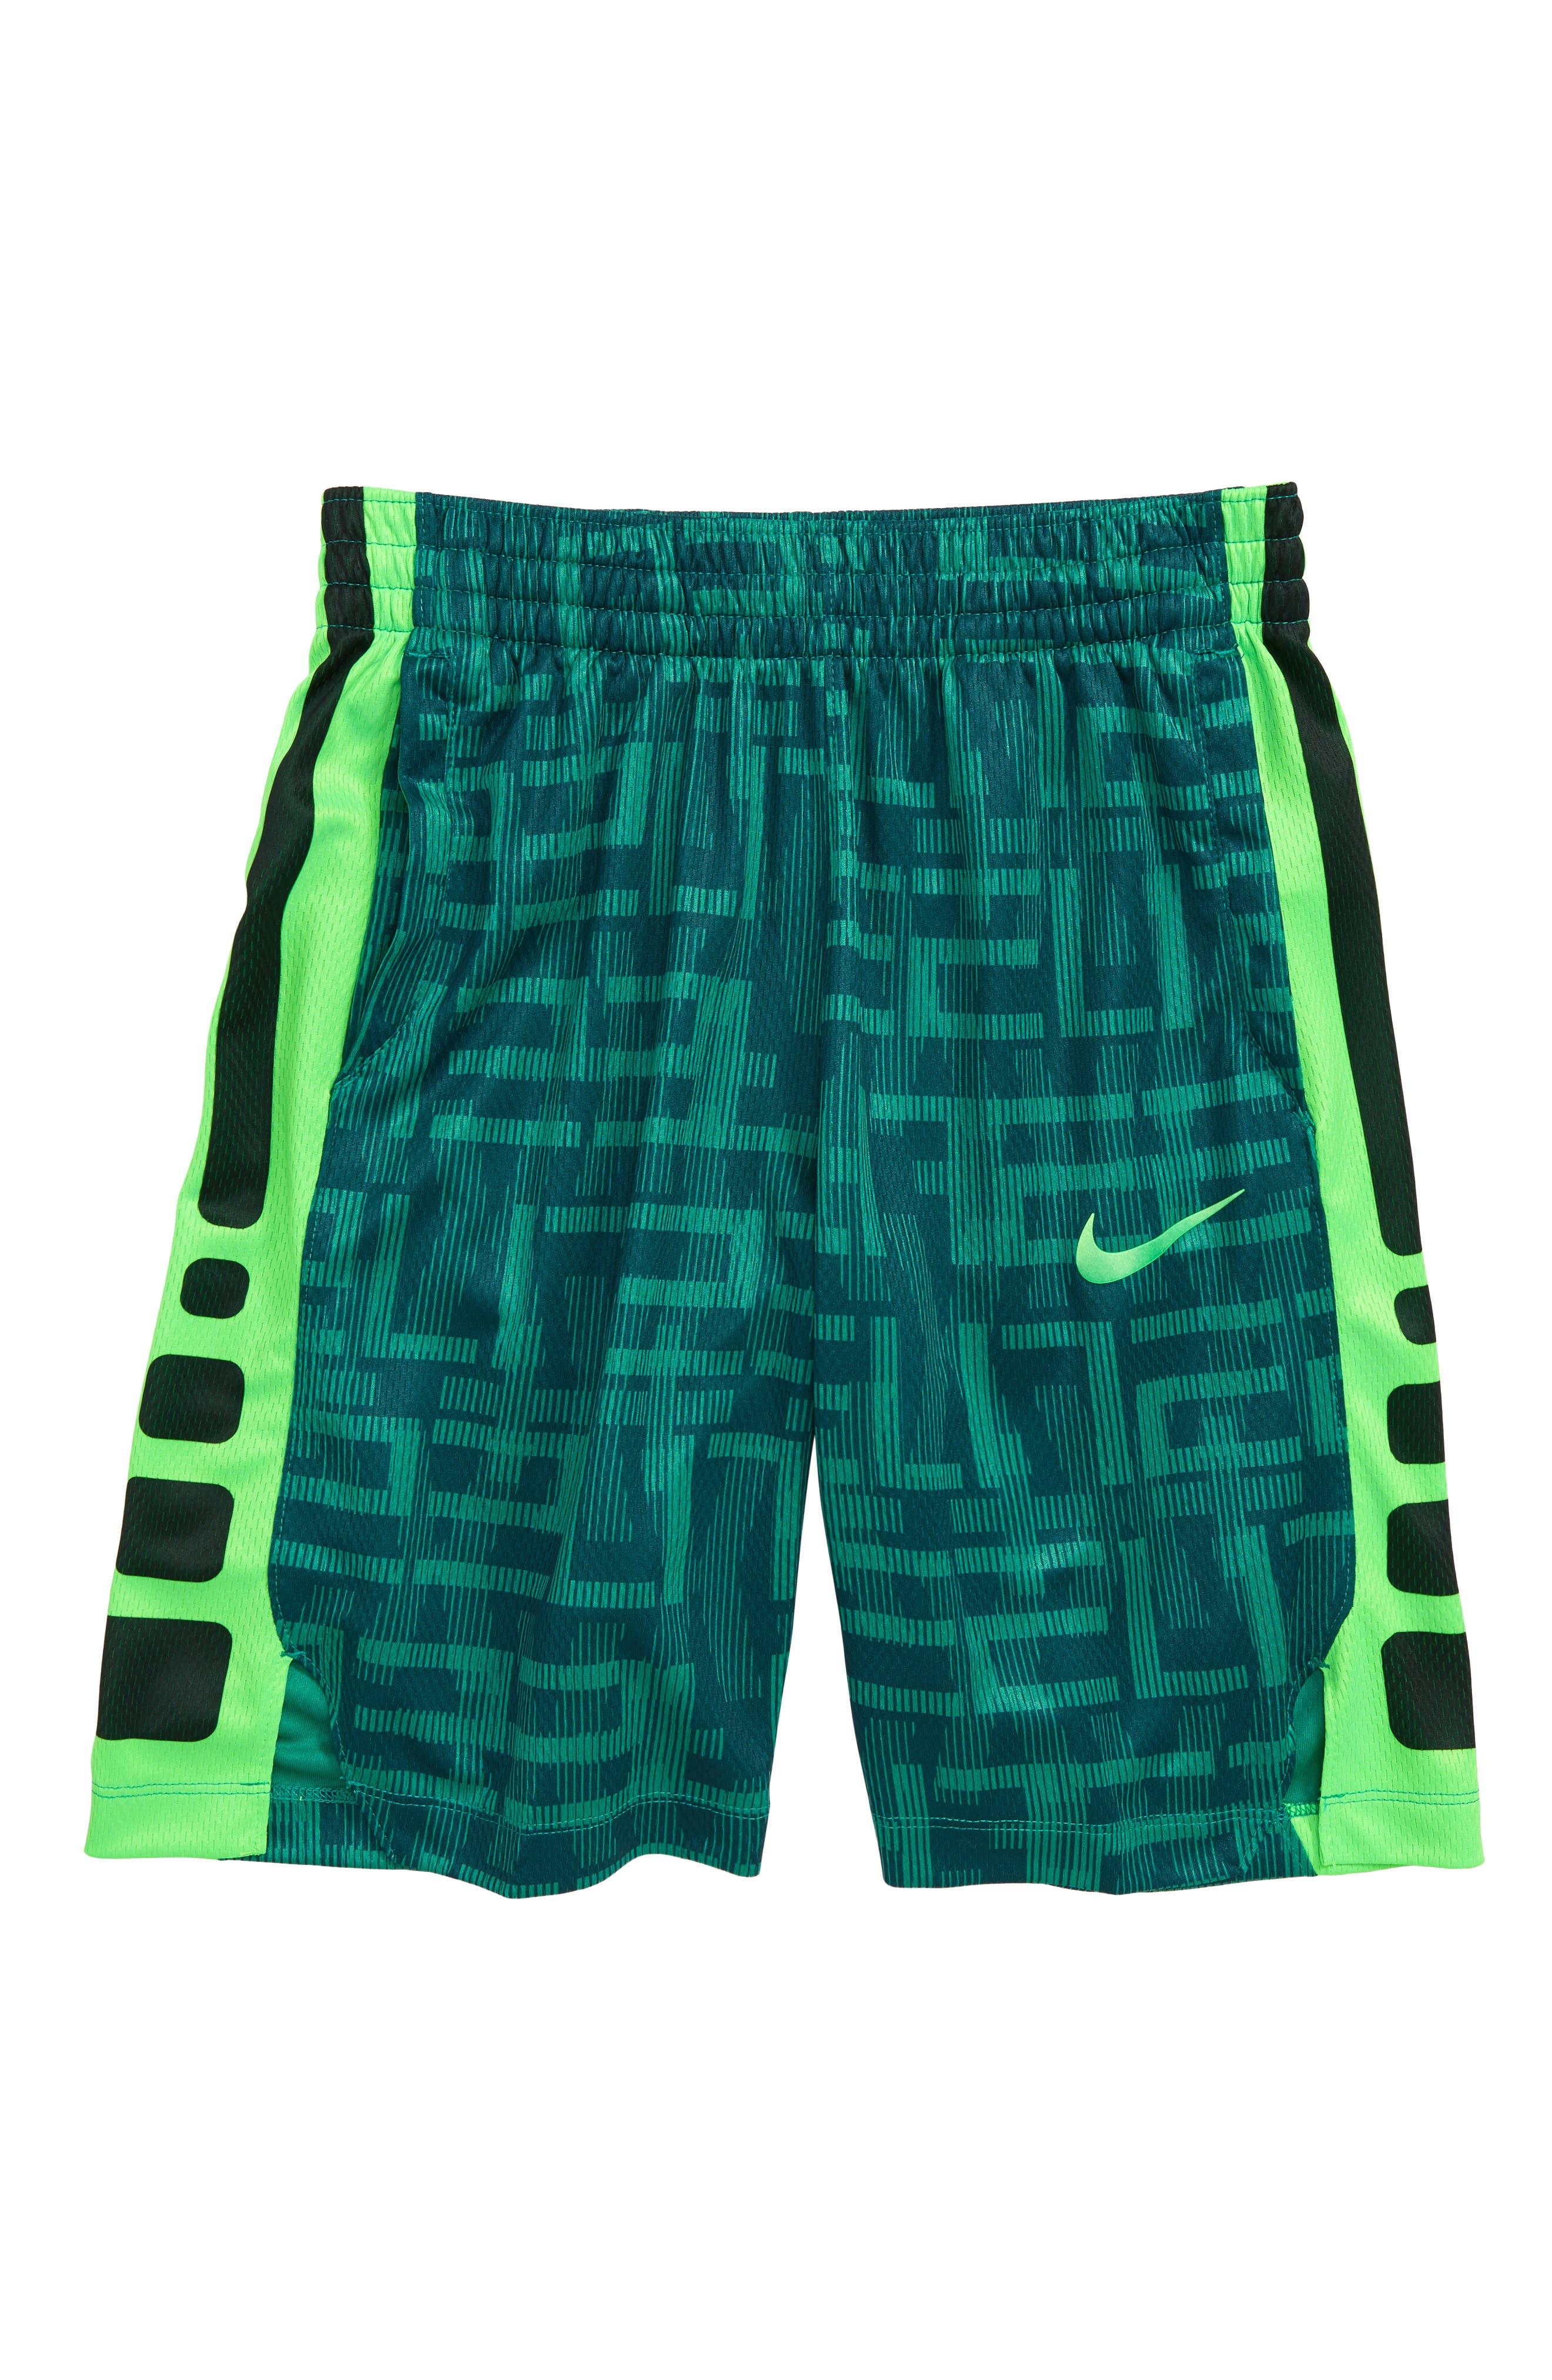 Dry Elite Basketball Shorts,                             Main thumbnail 1, color,                             Green Noise/ Black